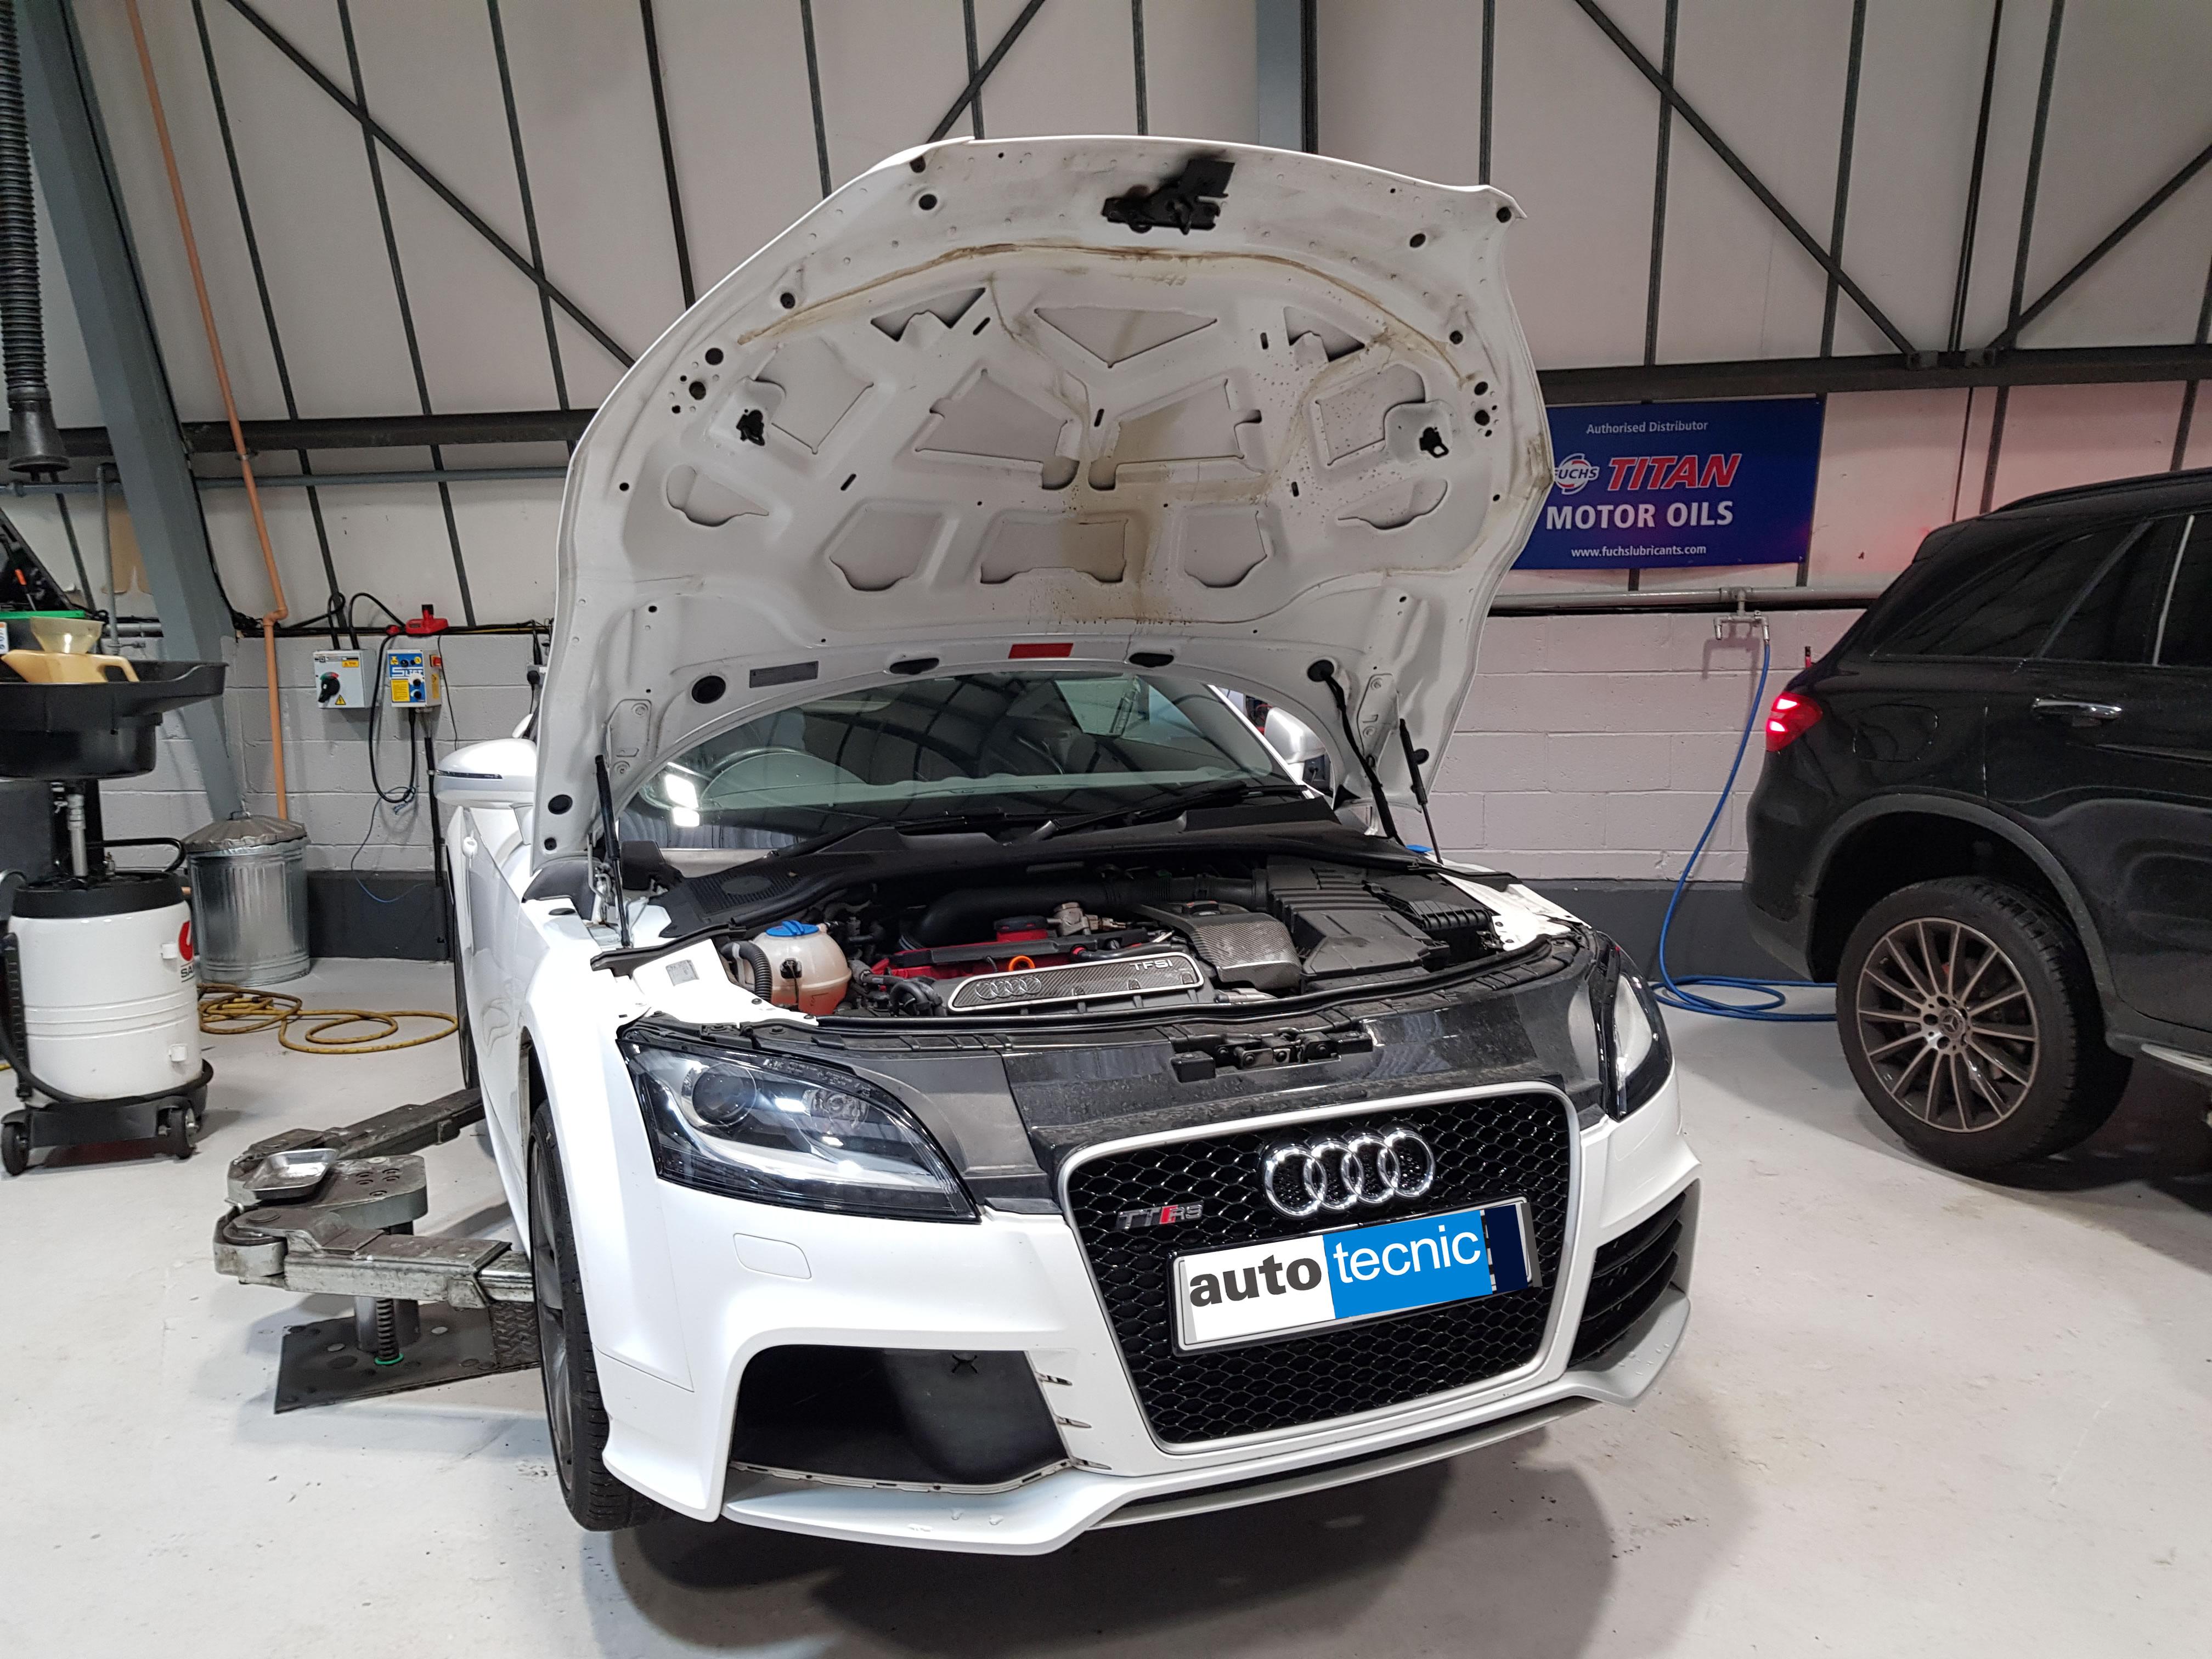 autotecnic - Audi TT 2.5